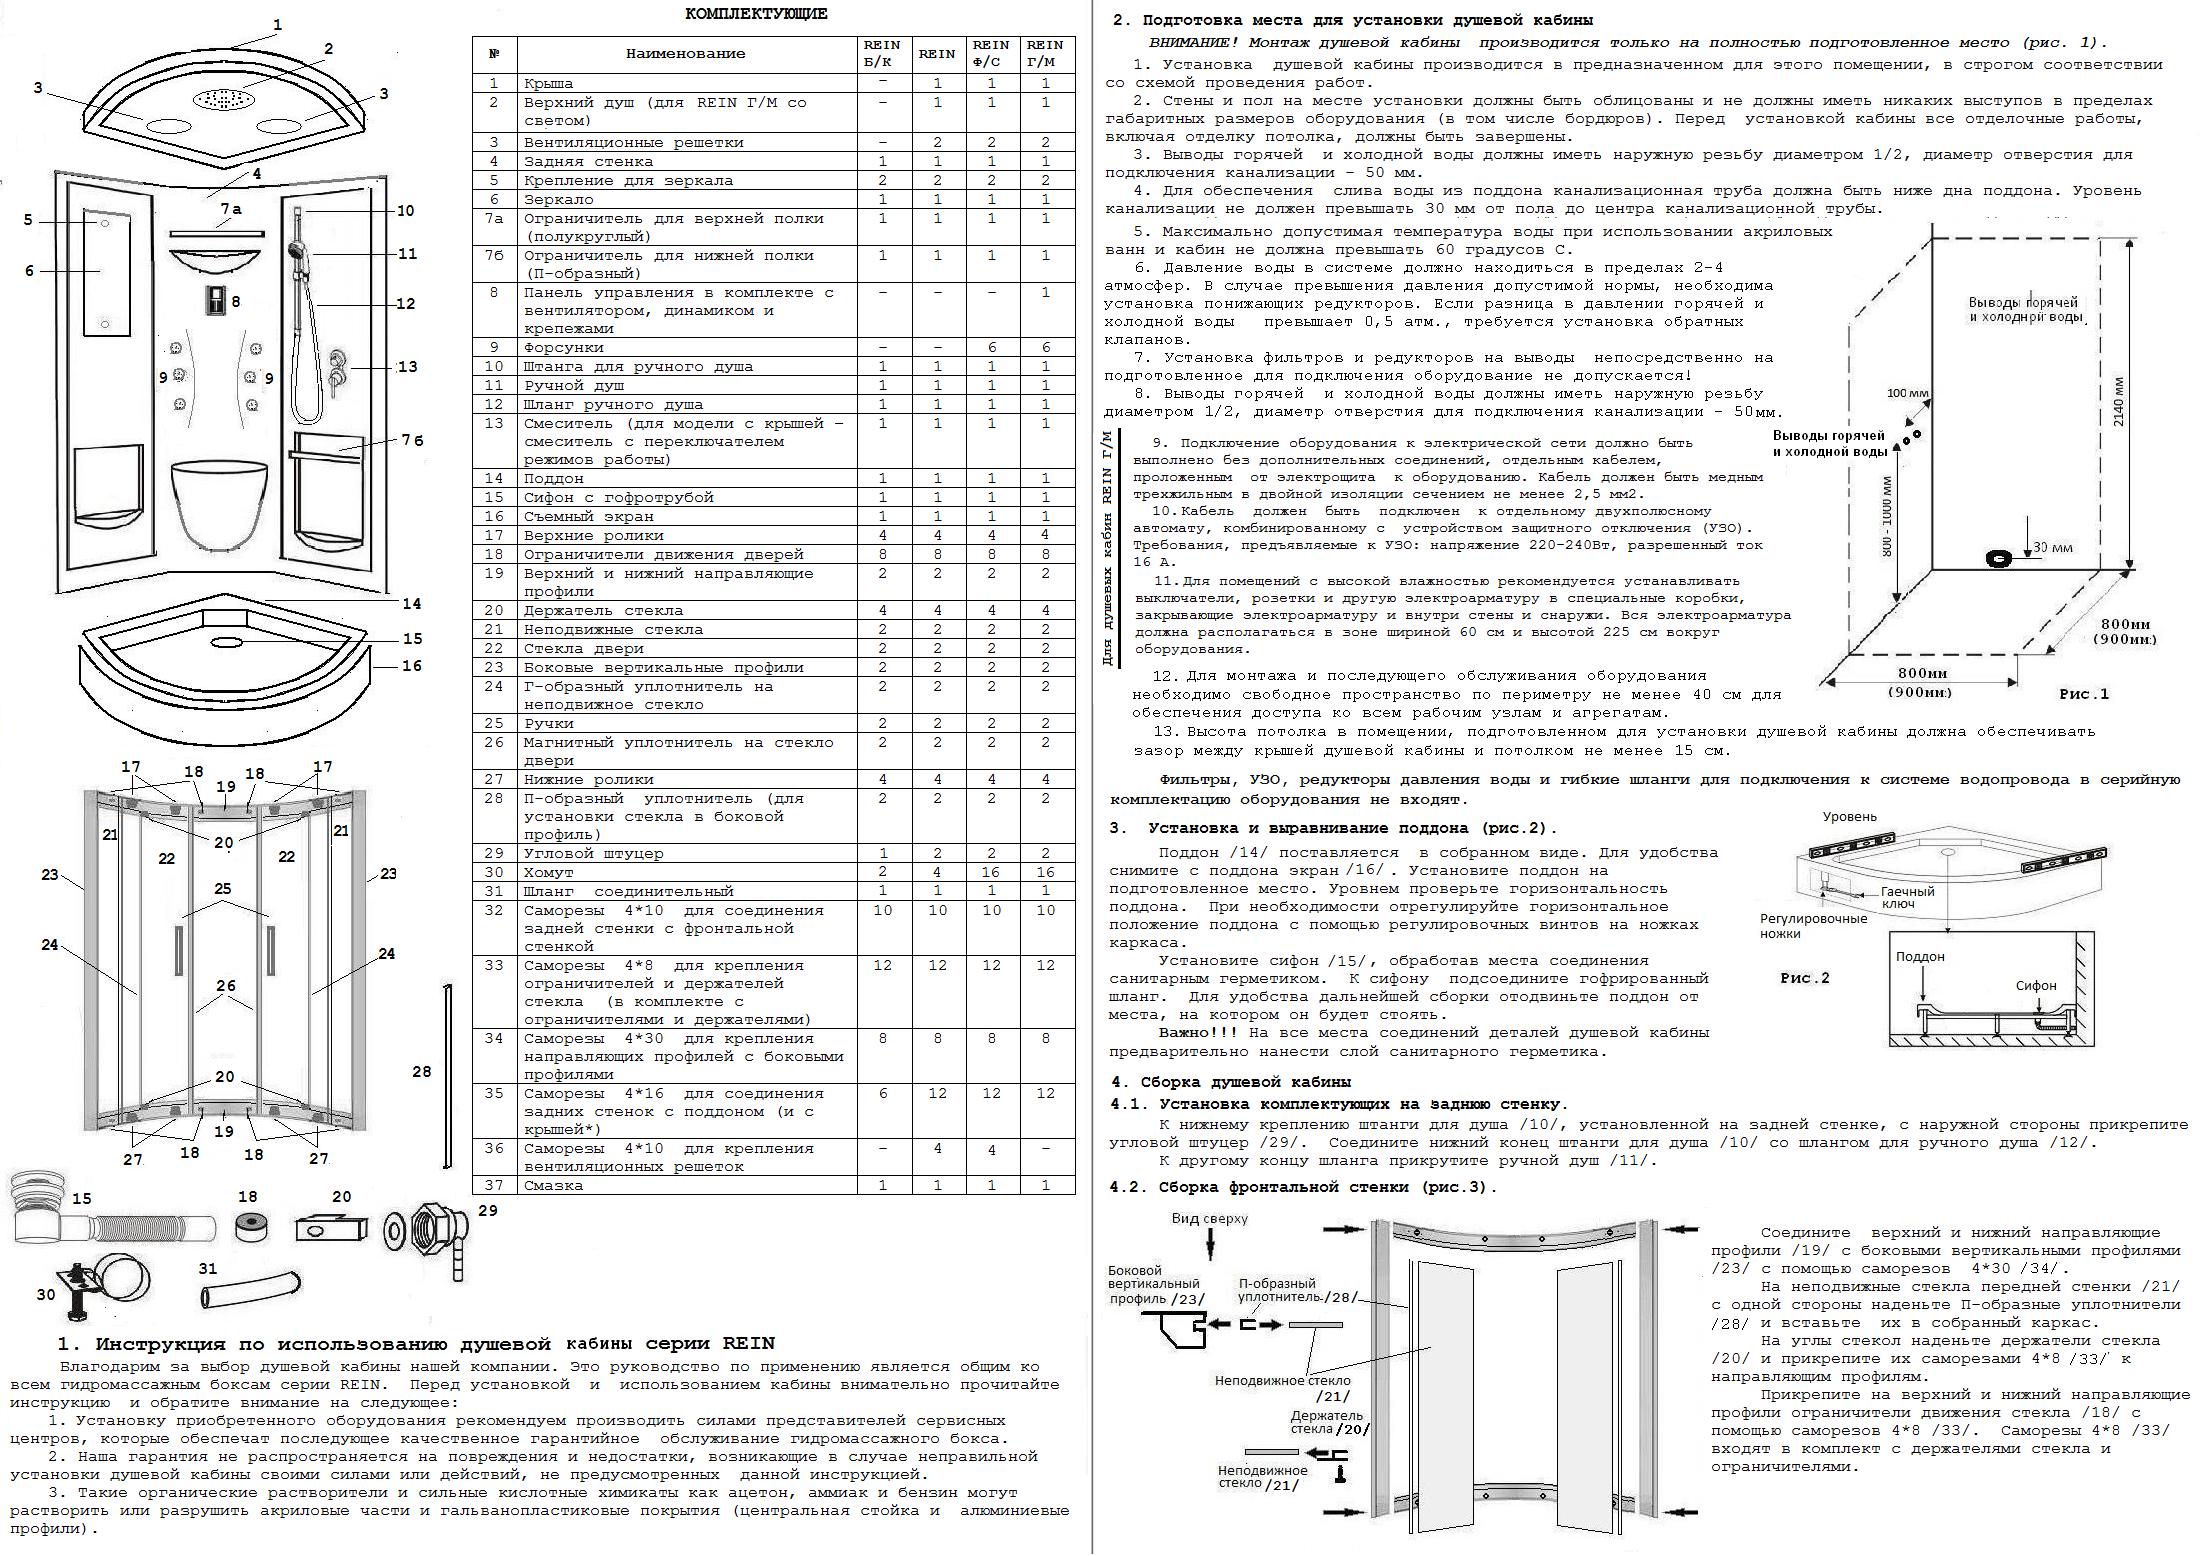 8805д душевая кабина схема сборки